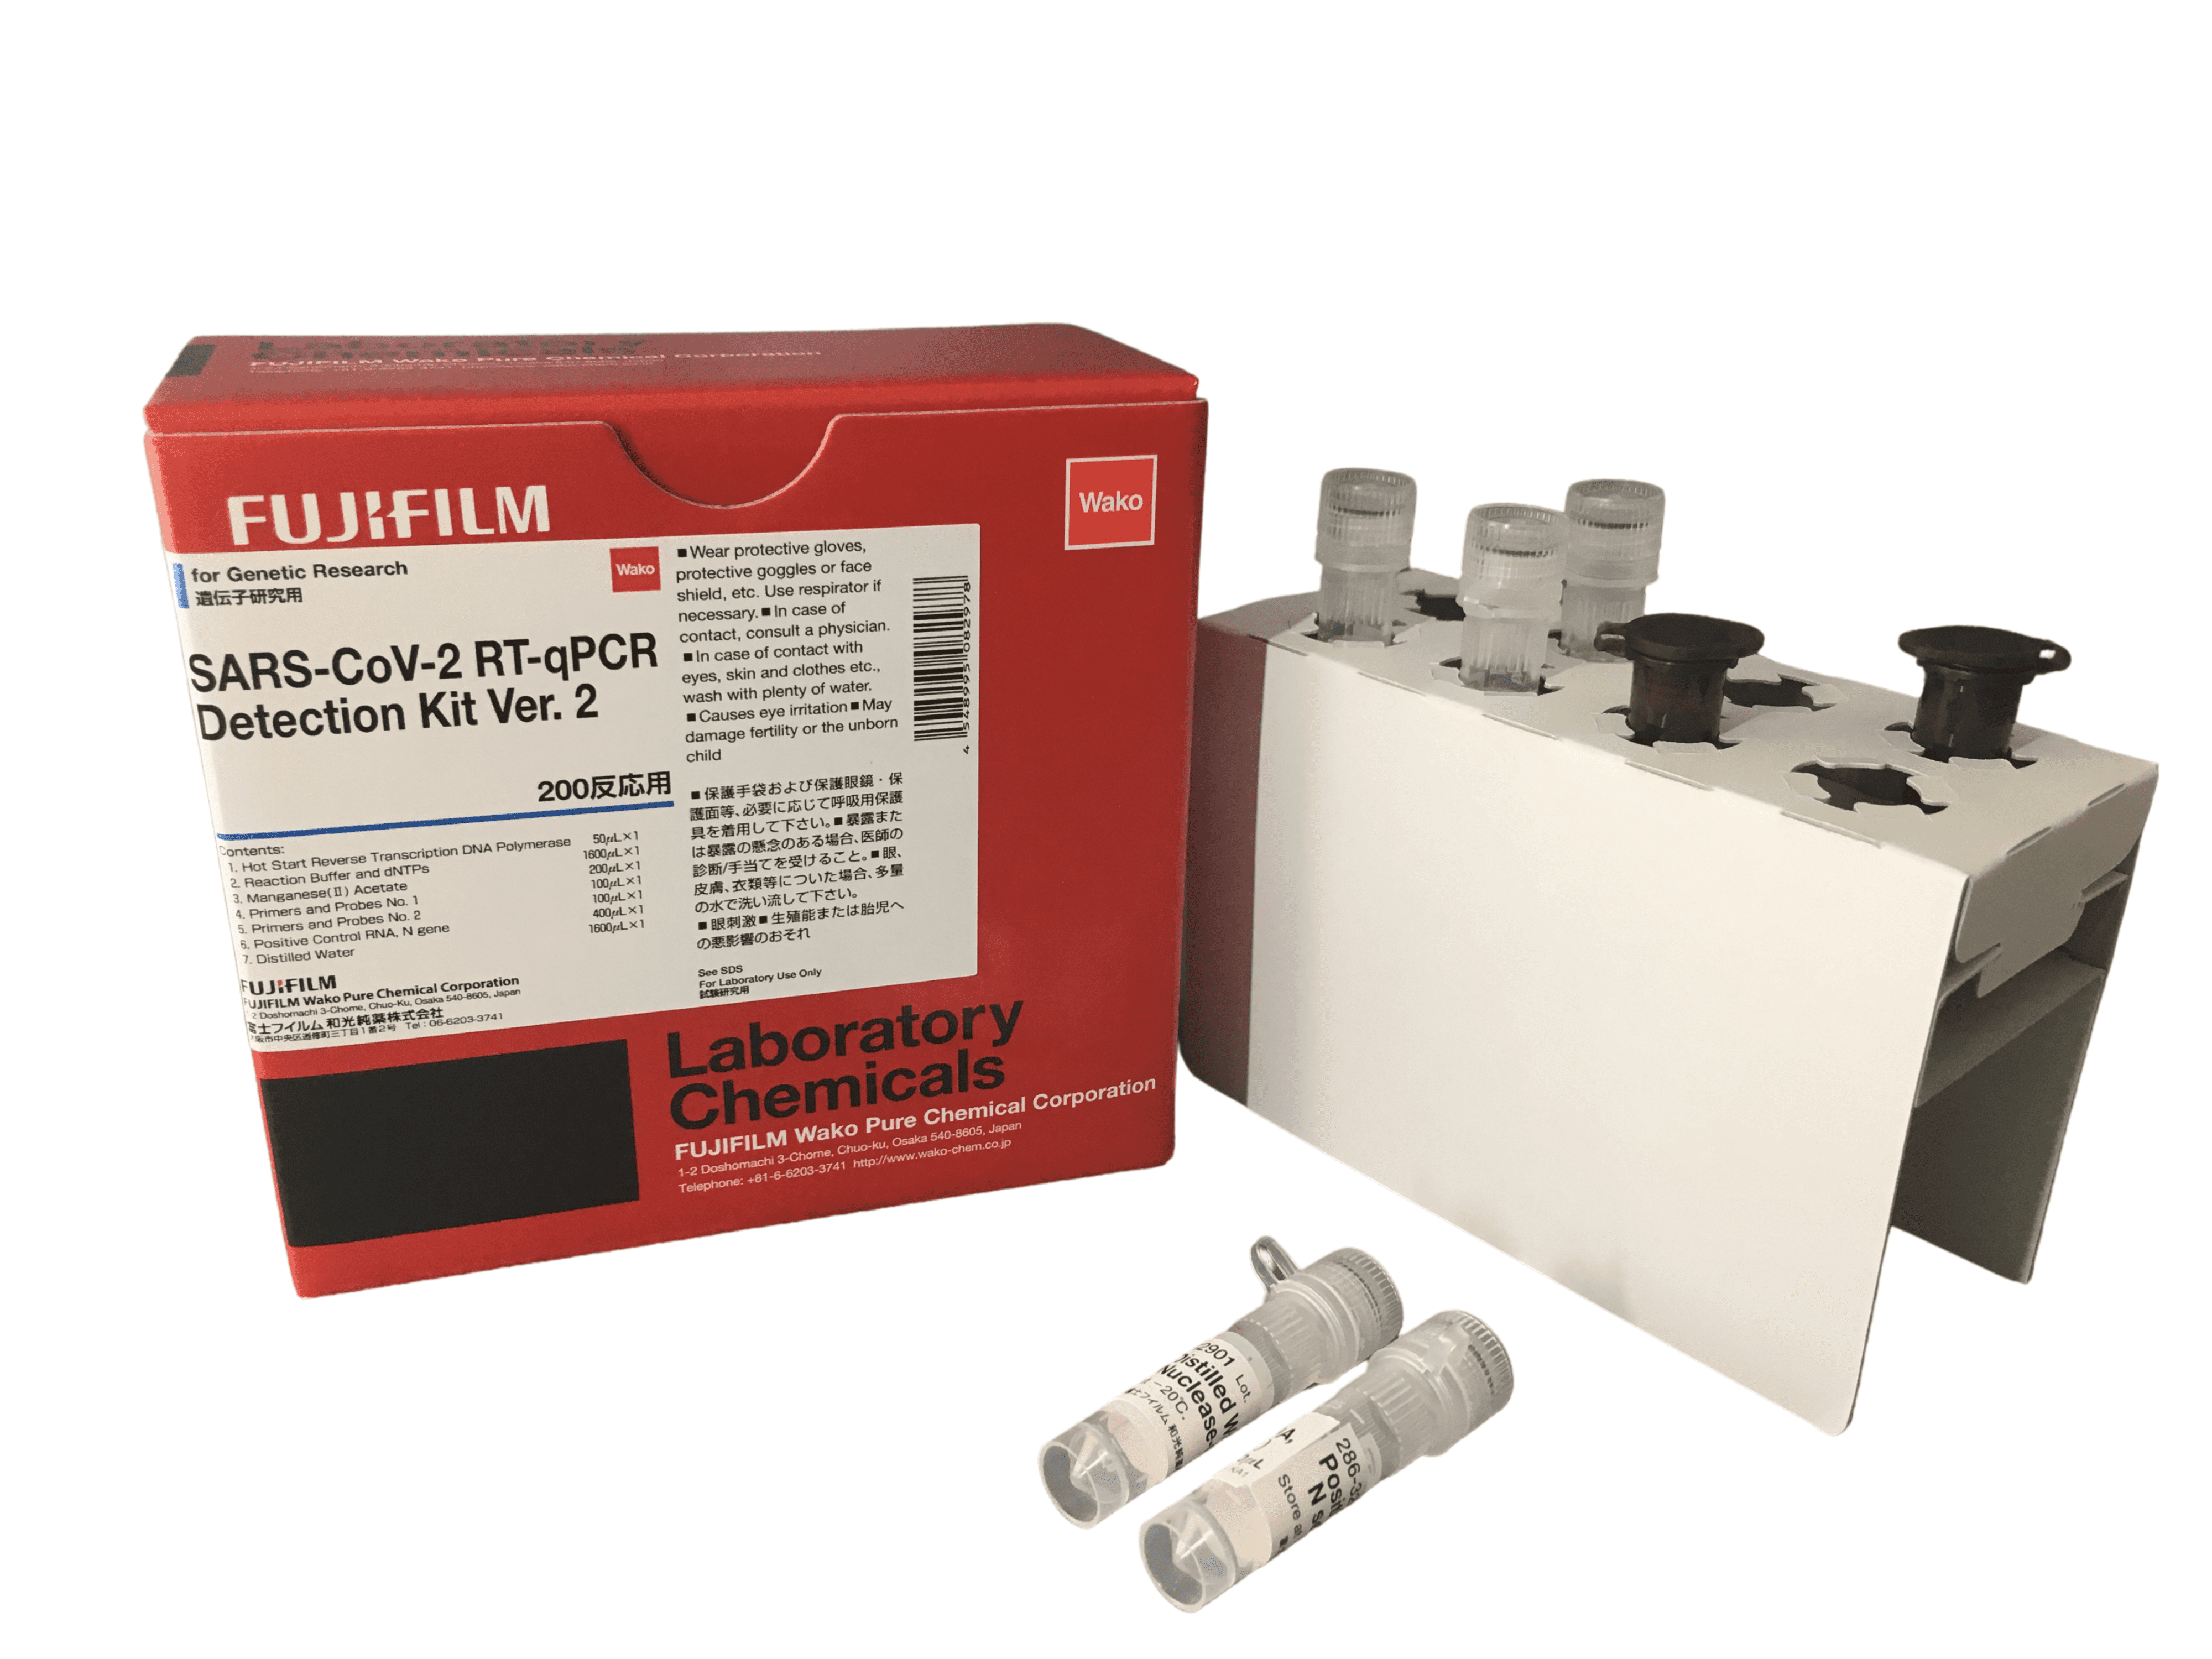 SARS-CoV-2 RT-qPCR Detection Kit Ver.2SARS-CoV-2 RT-qPCR Detection Kit Ver.2